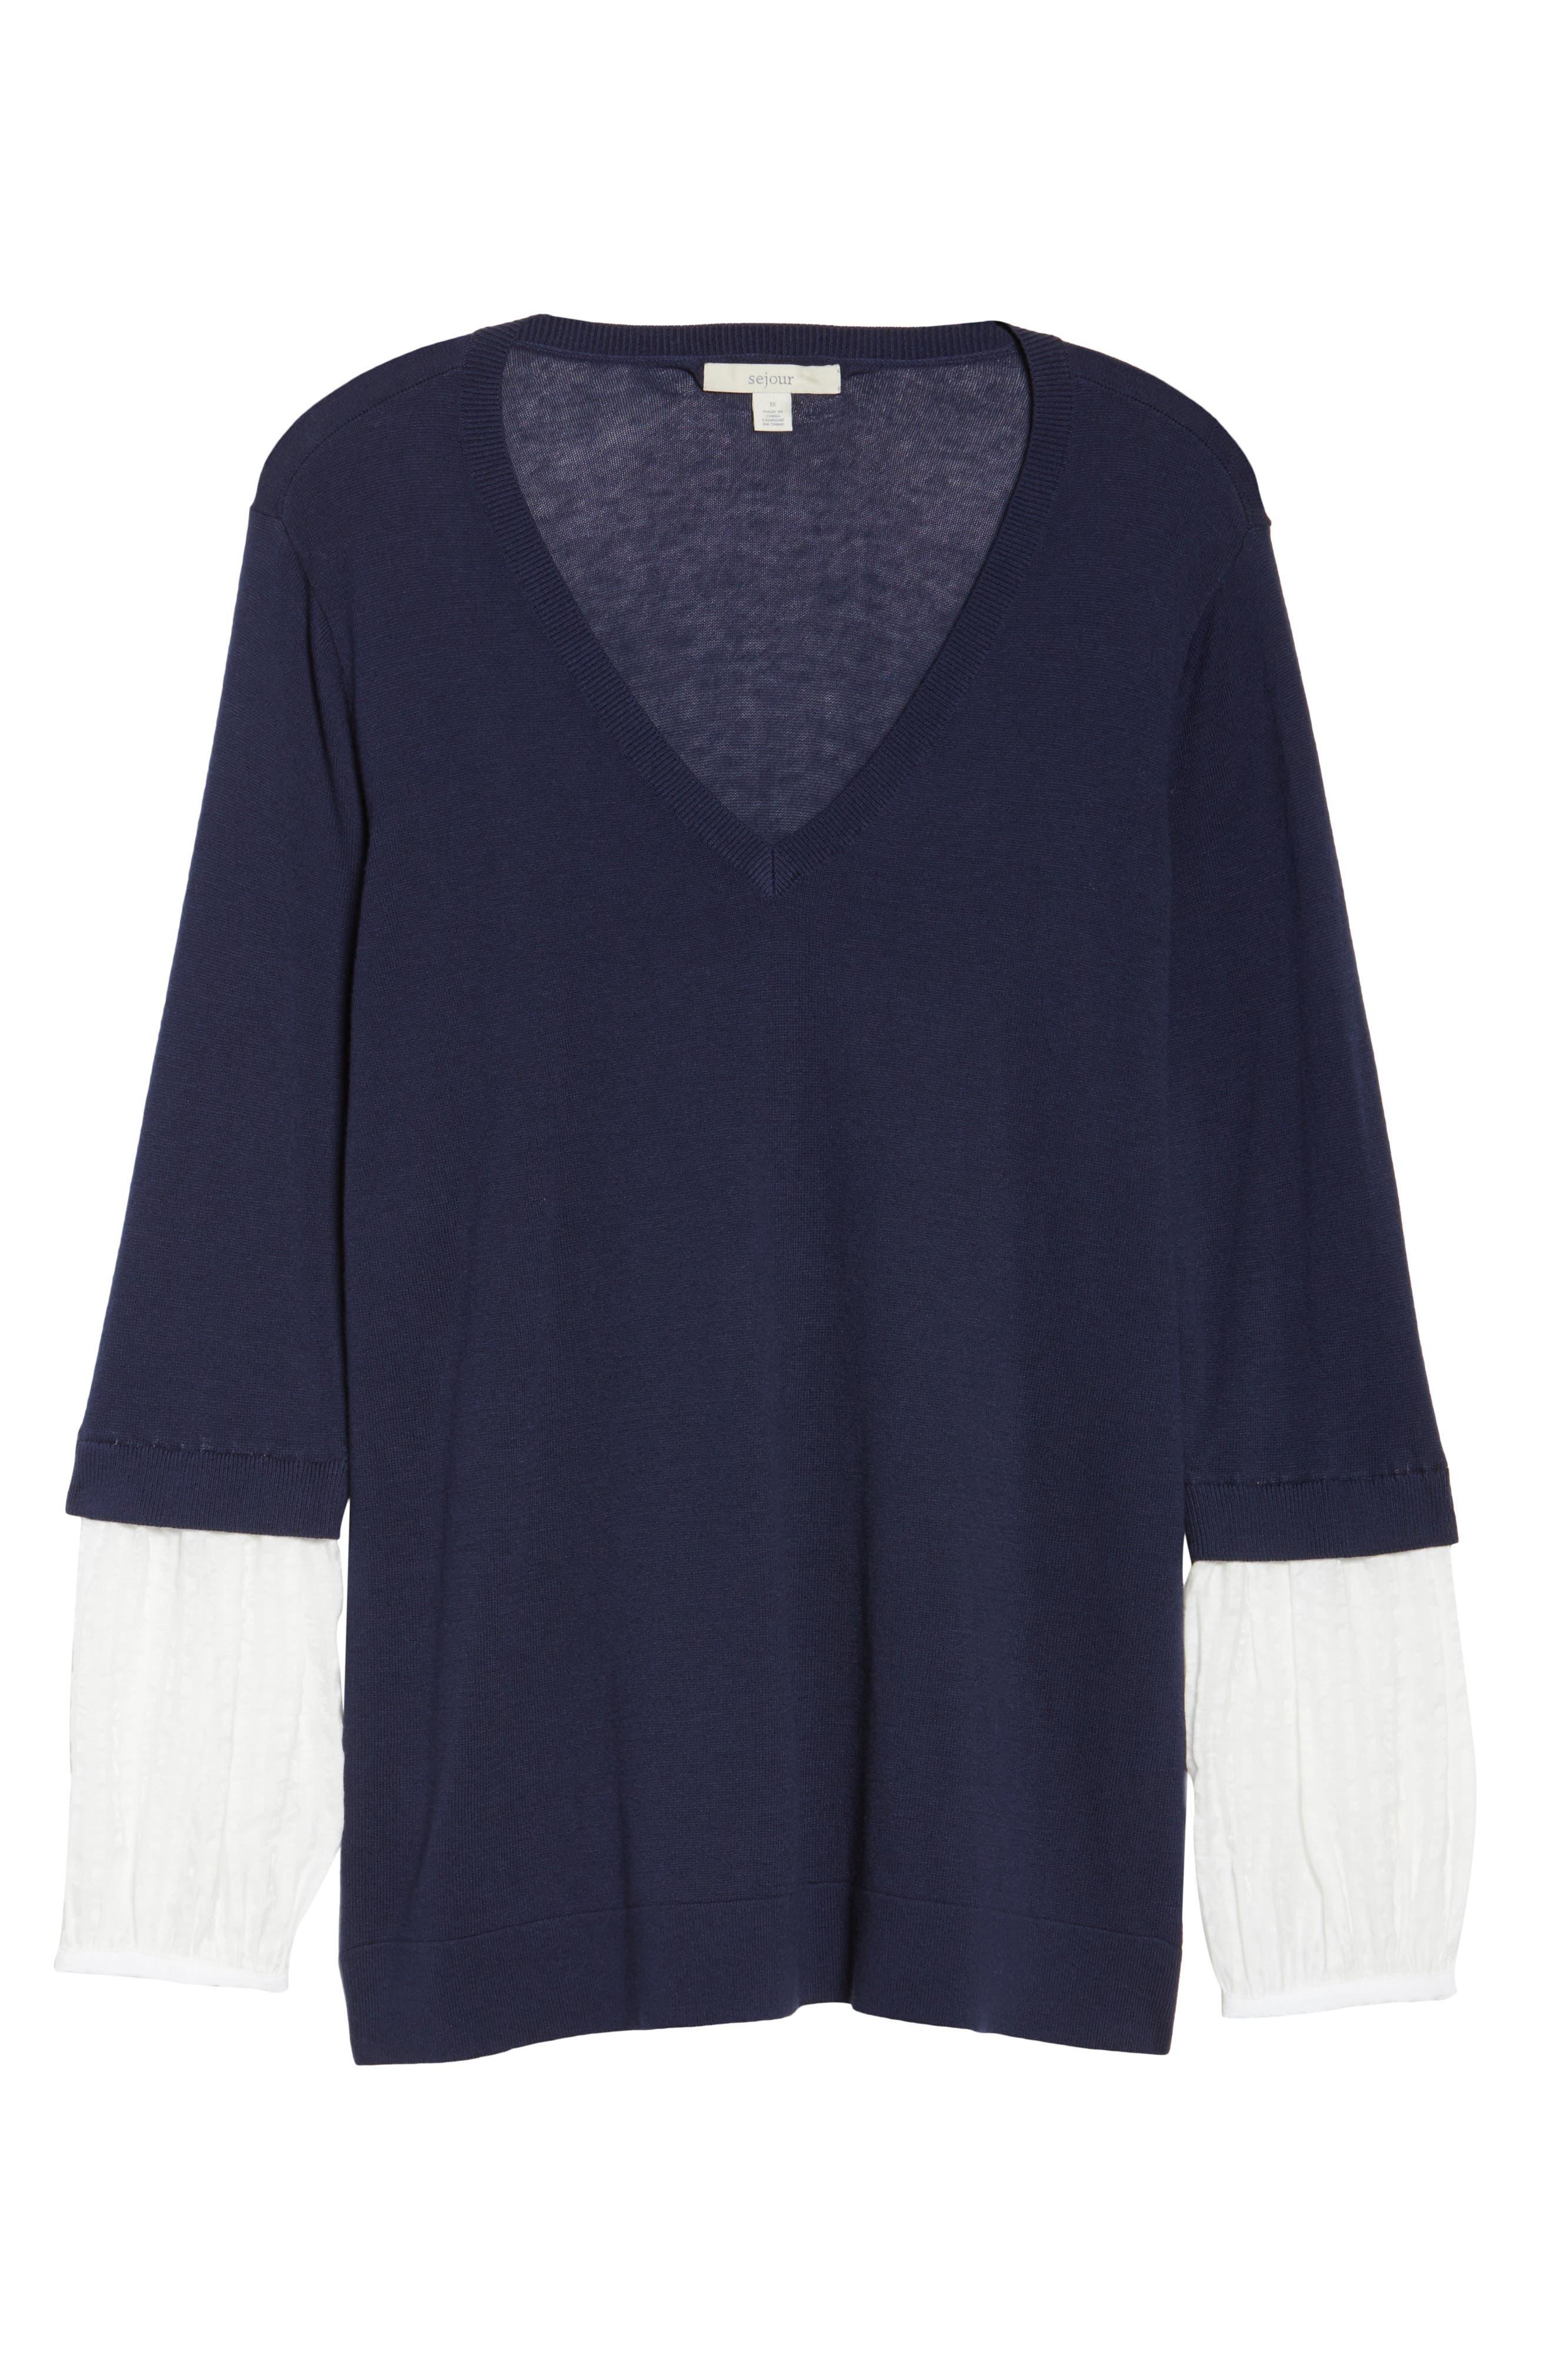 Mix Media Sweater,                             Alternate thumbnail 6, color,                             Navy- White Combo